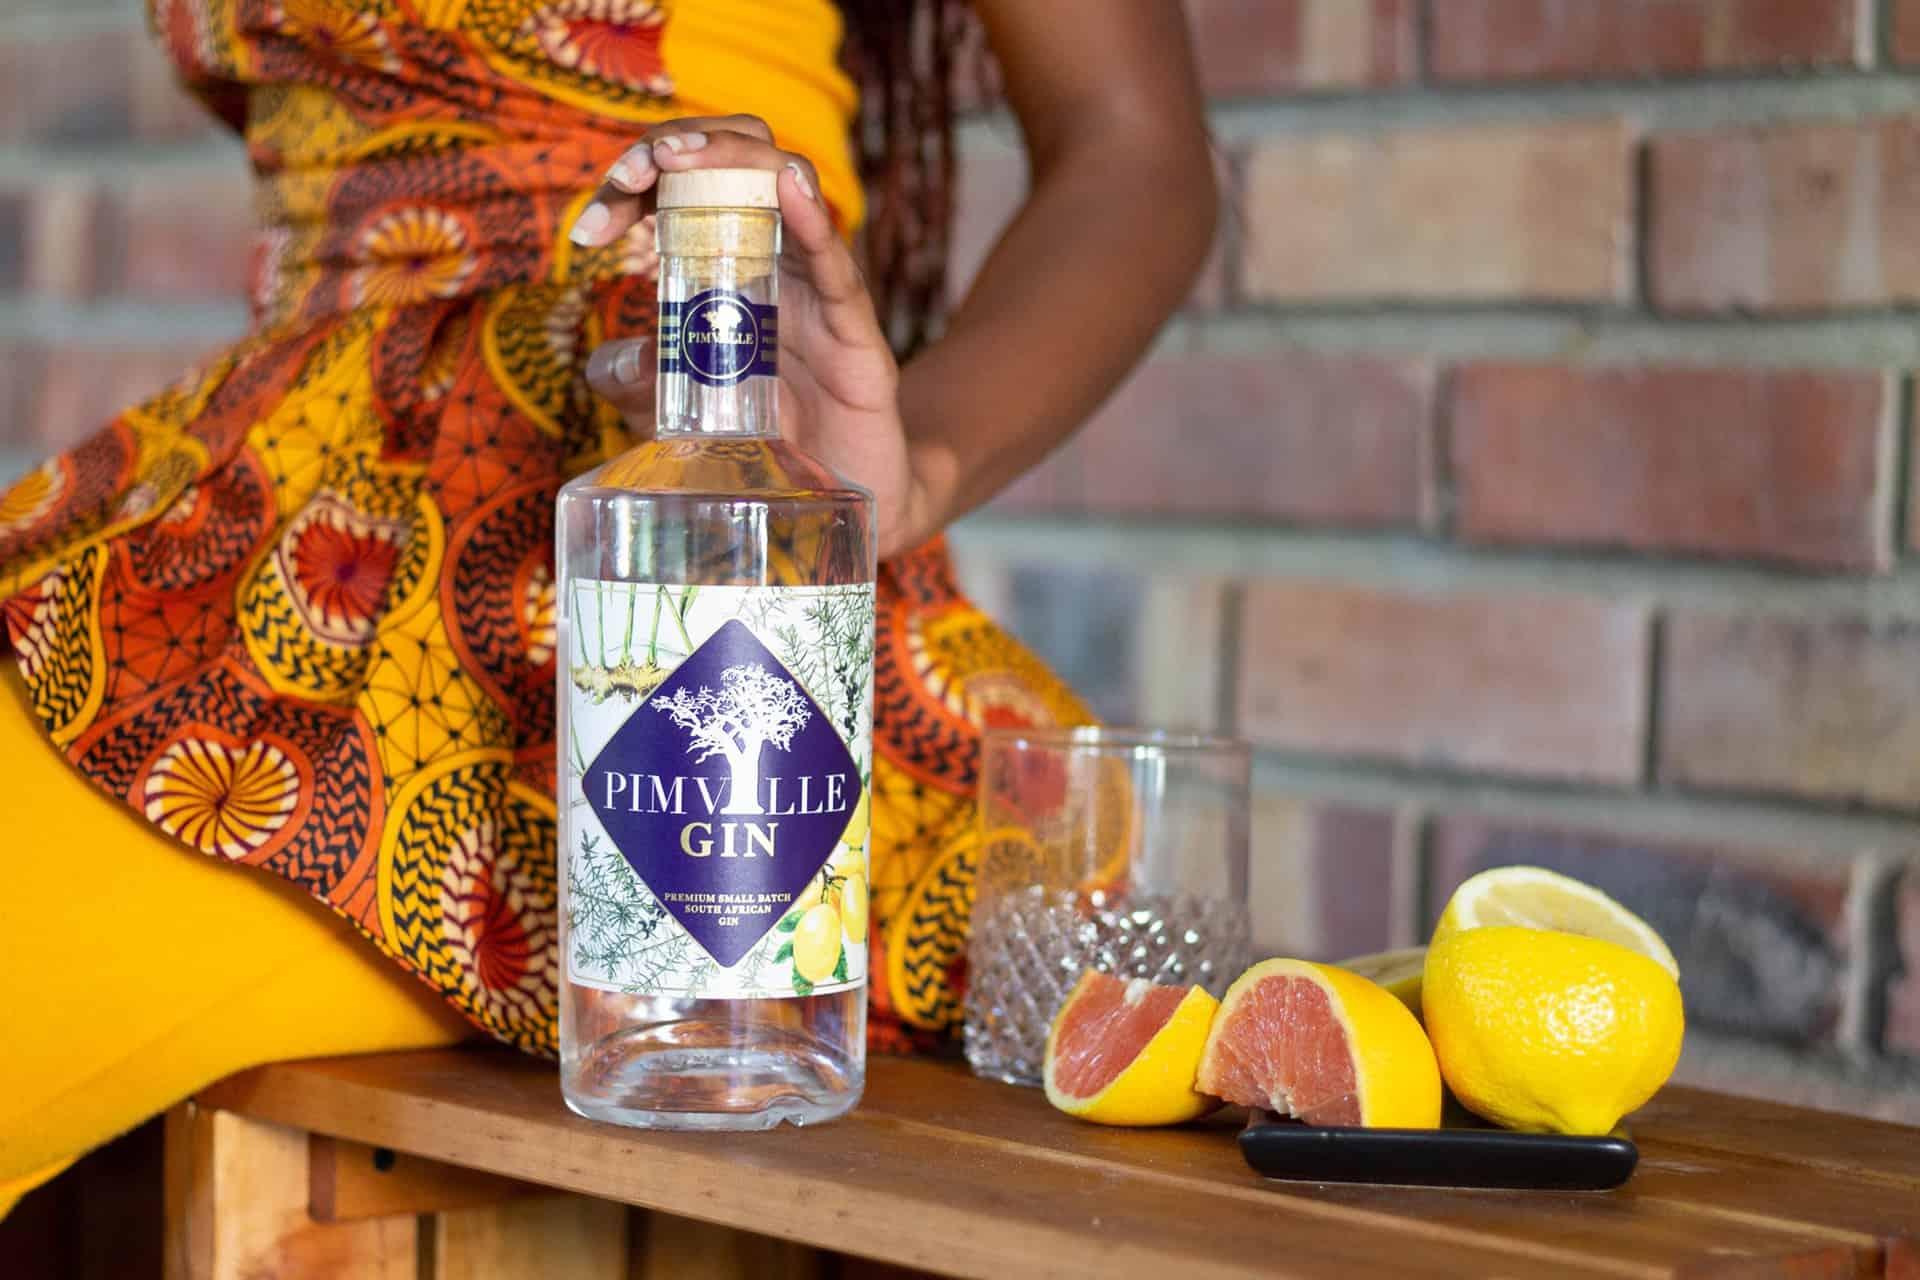 Pimville Gin | Premier quality Gin